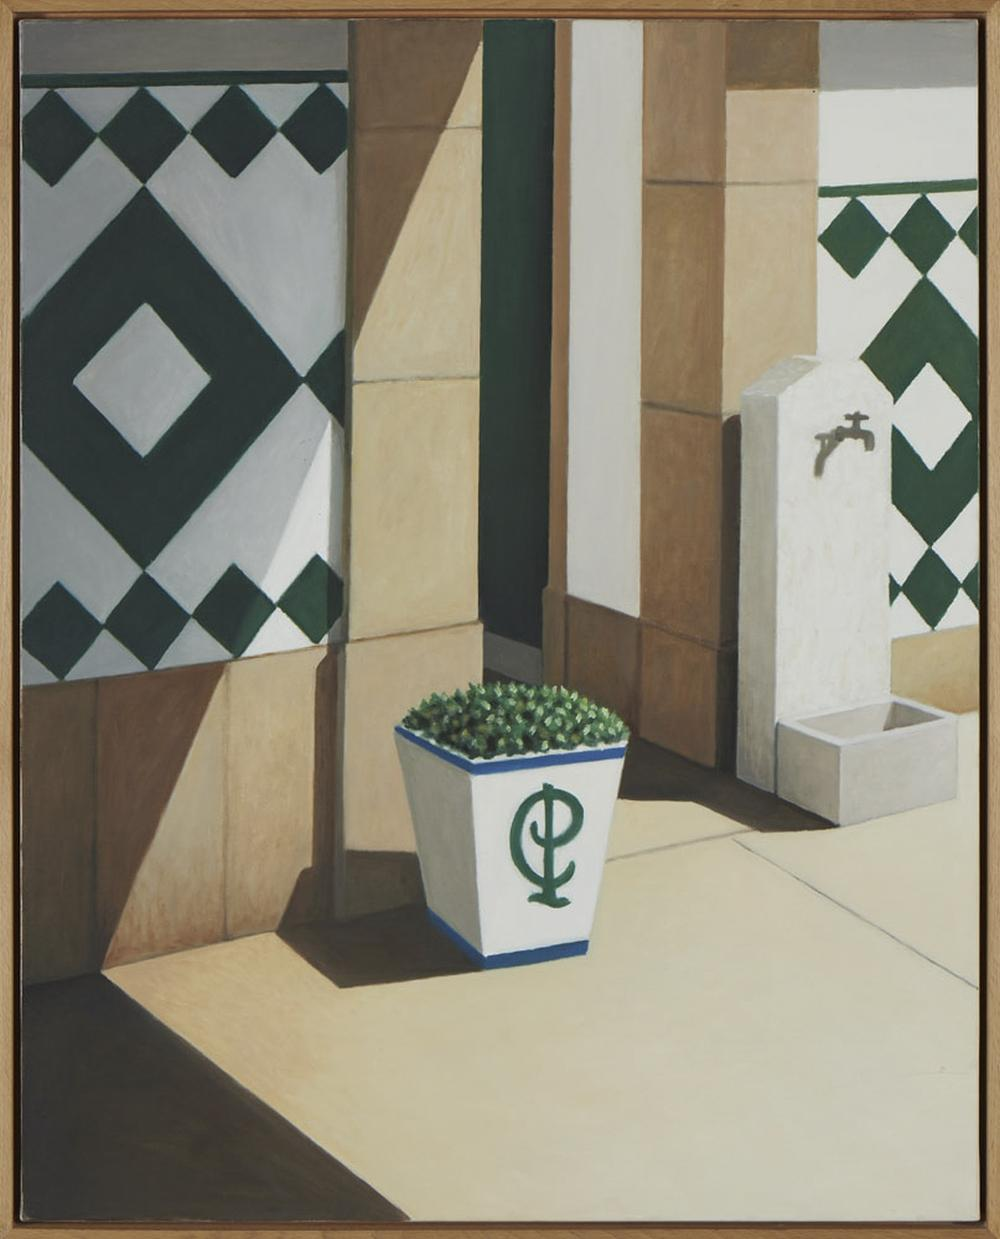 MANUEL AMADO, Óleo sobre tela, 92 x 73 cm.